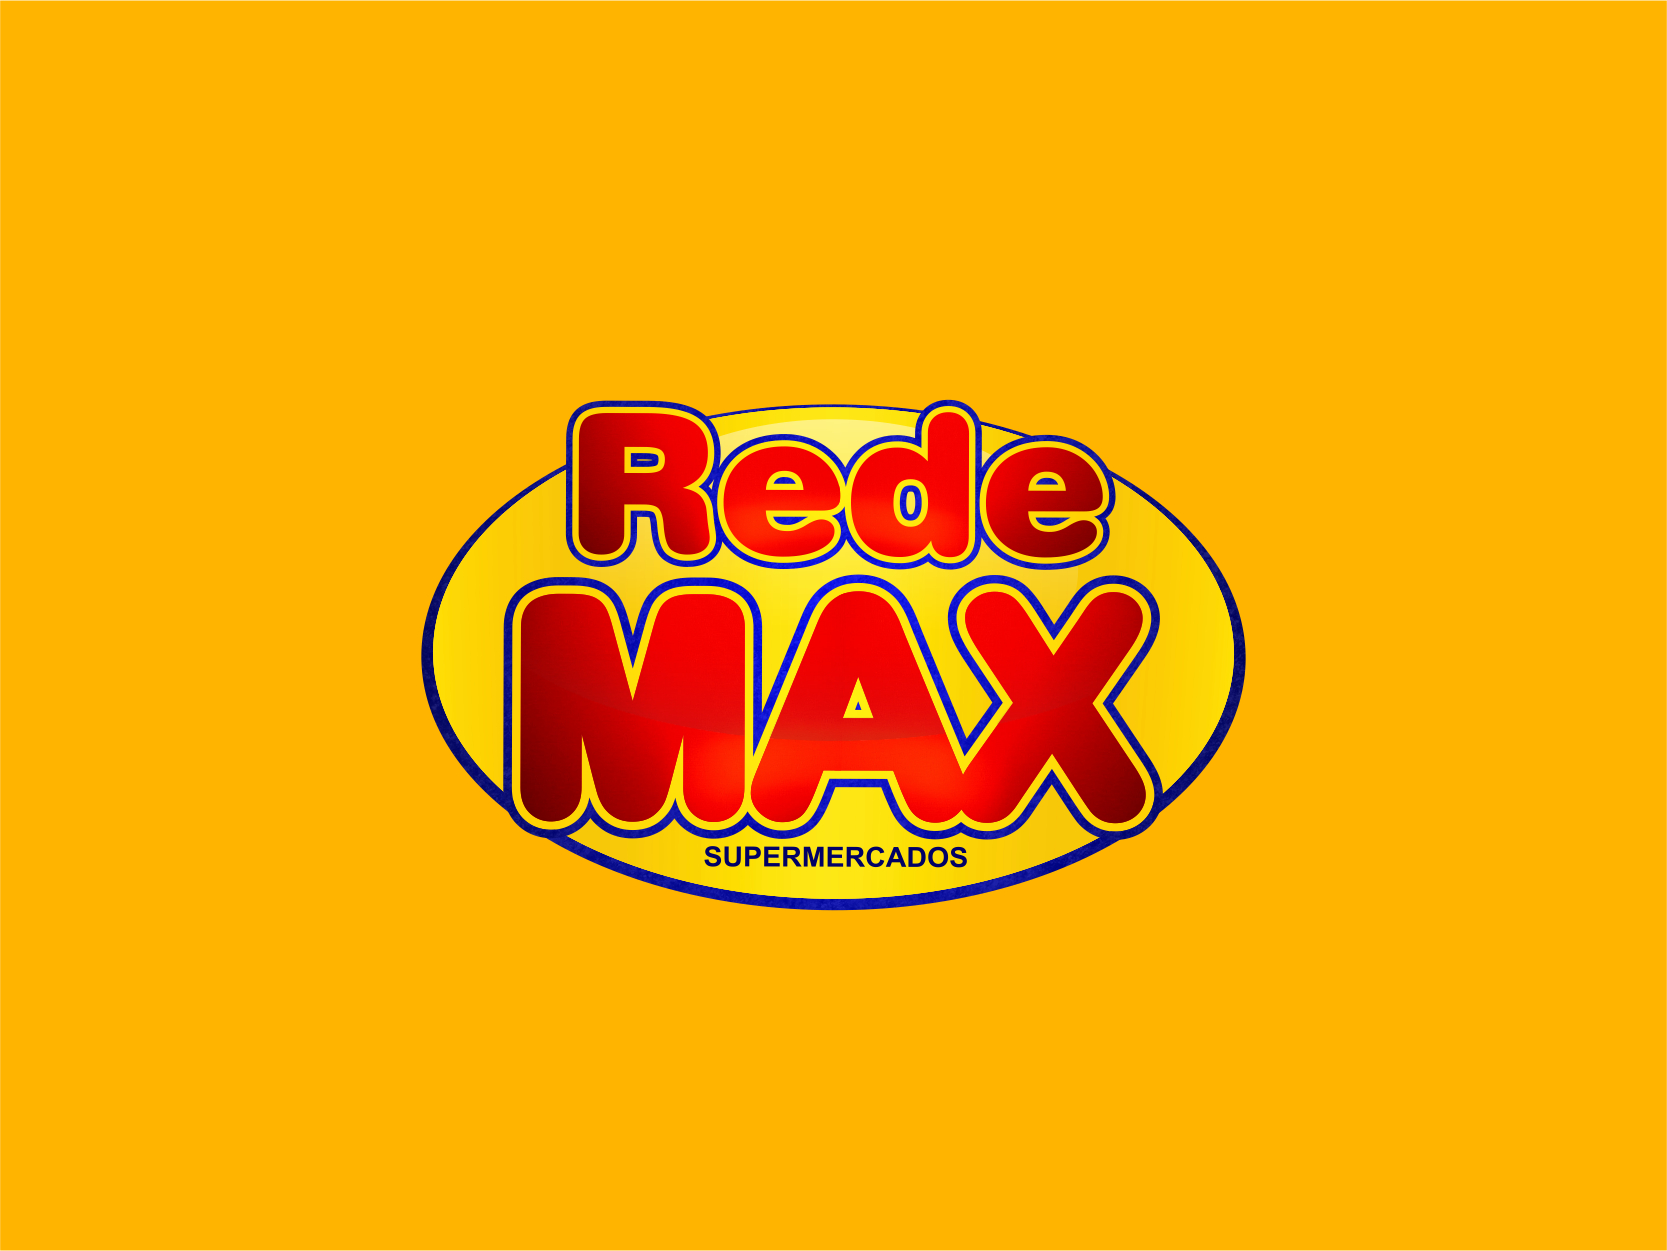 REDE MAX SUPERMERCADOS